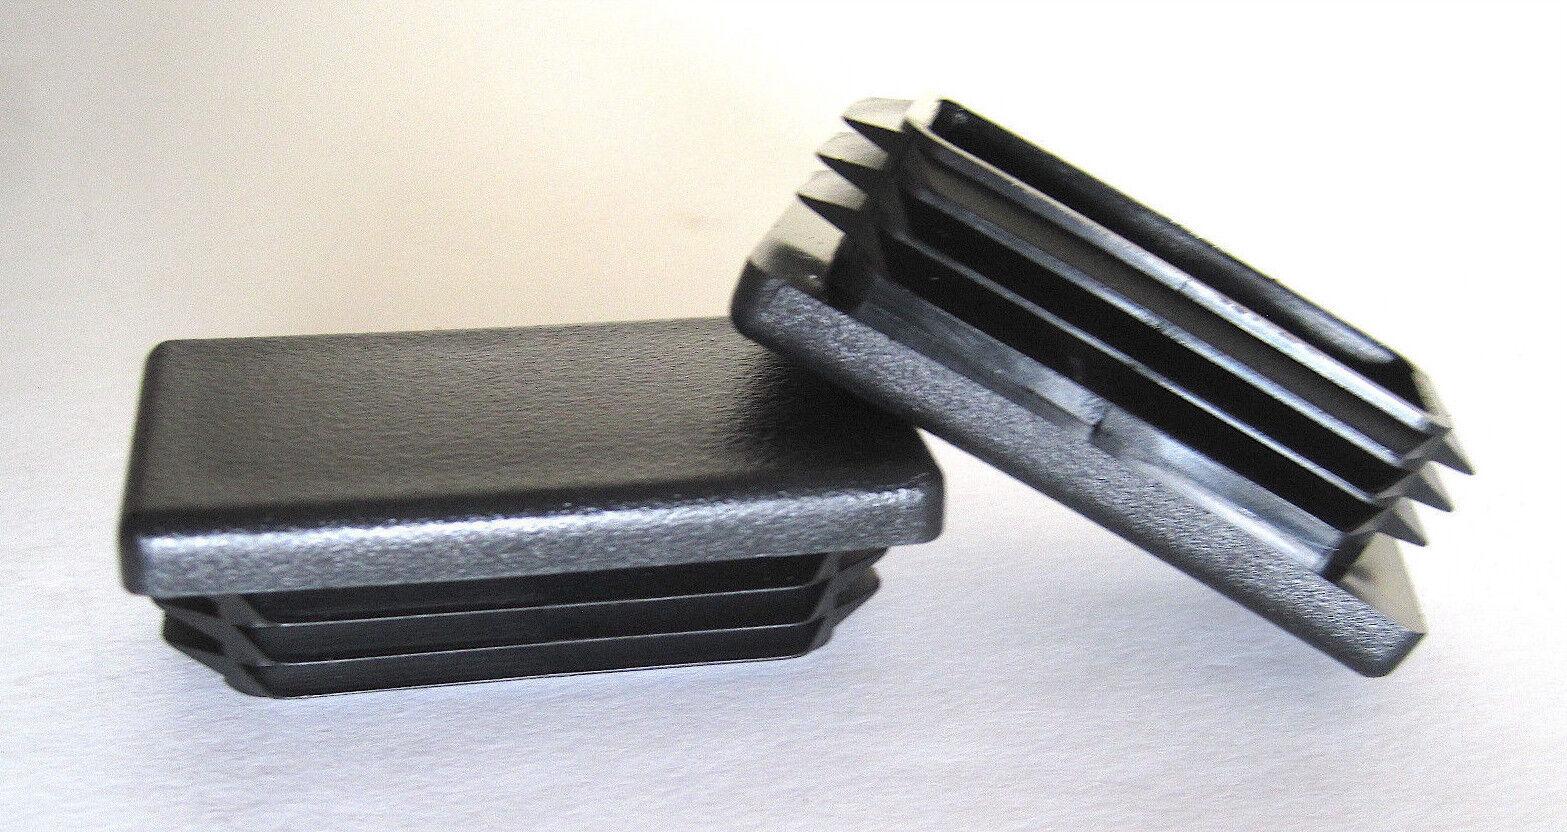 Quantity of 8 1 X 2 Rectangle TUBING END Cap Plug